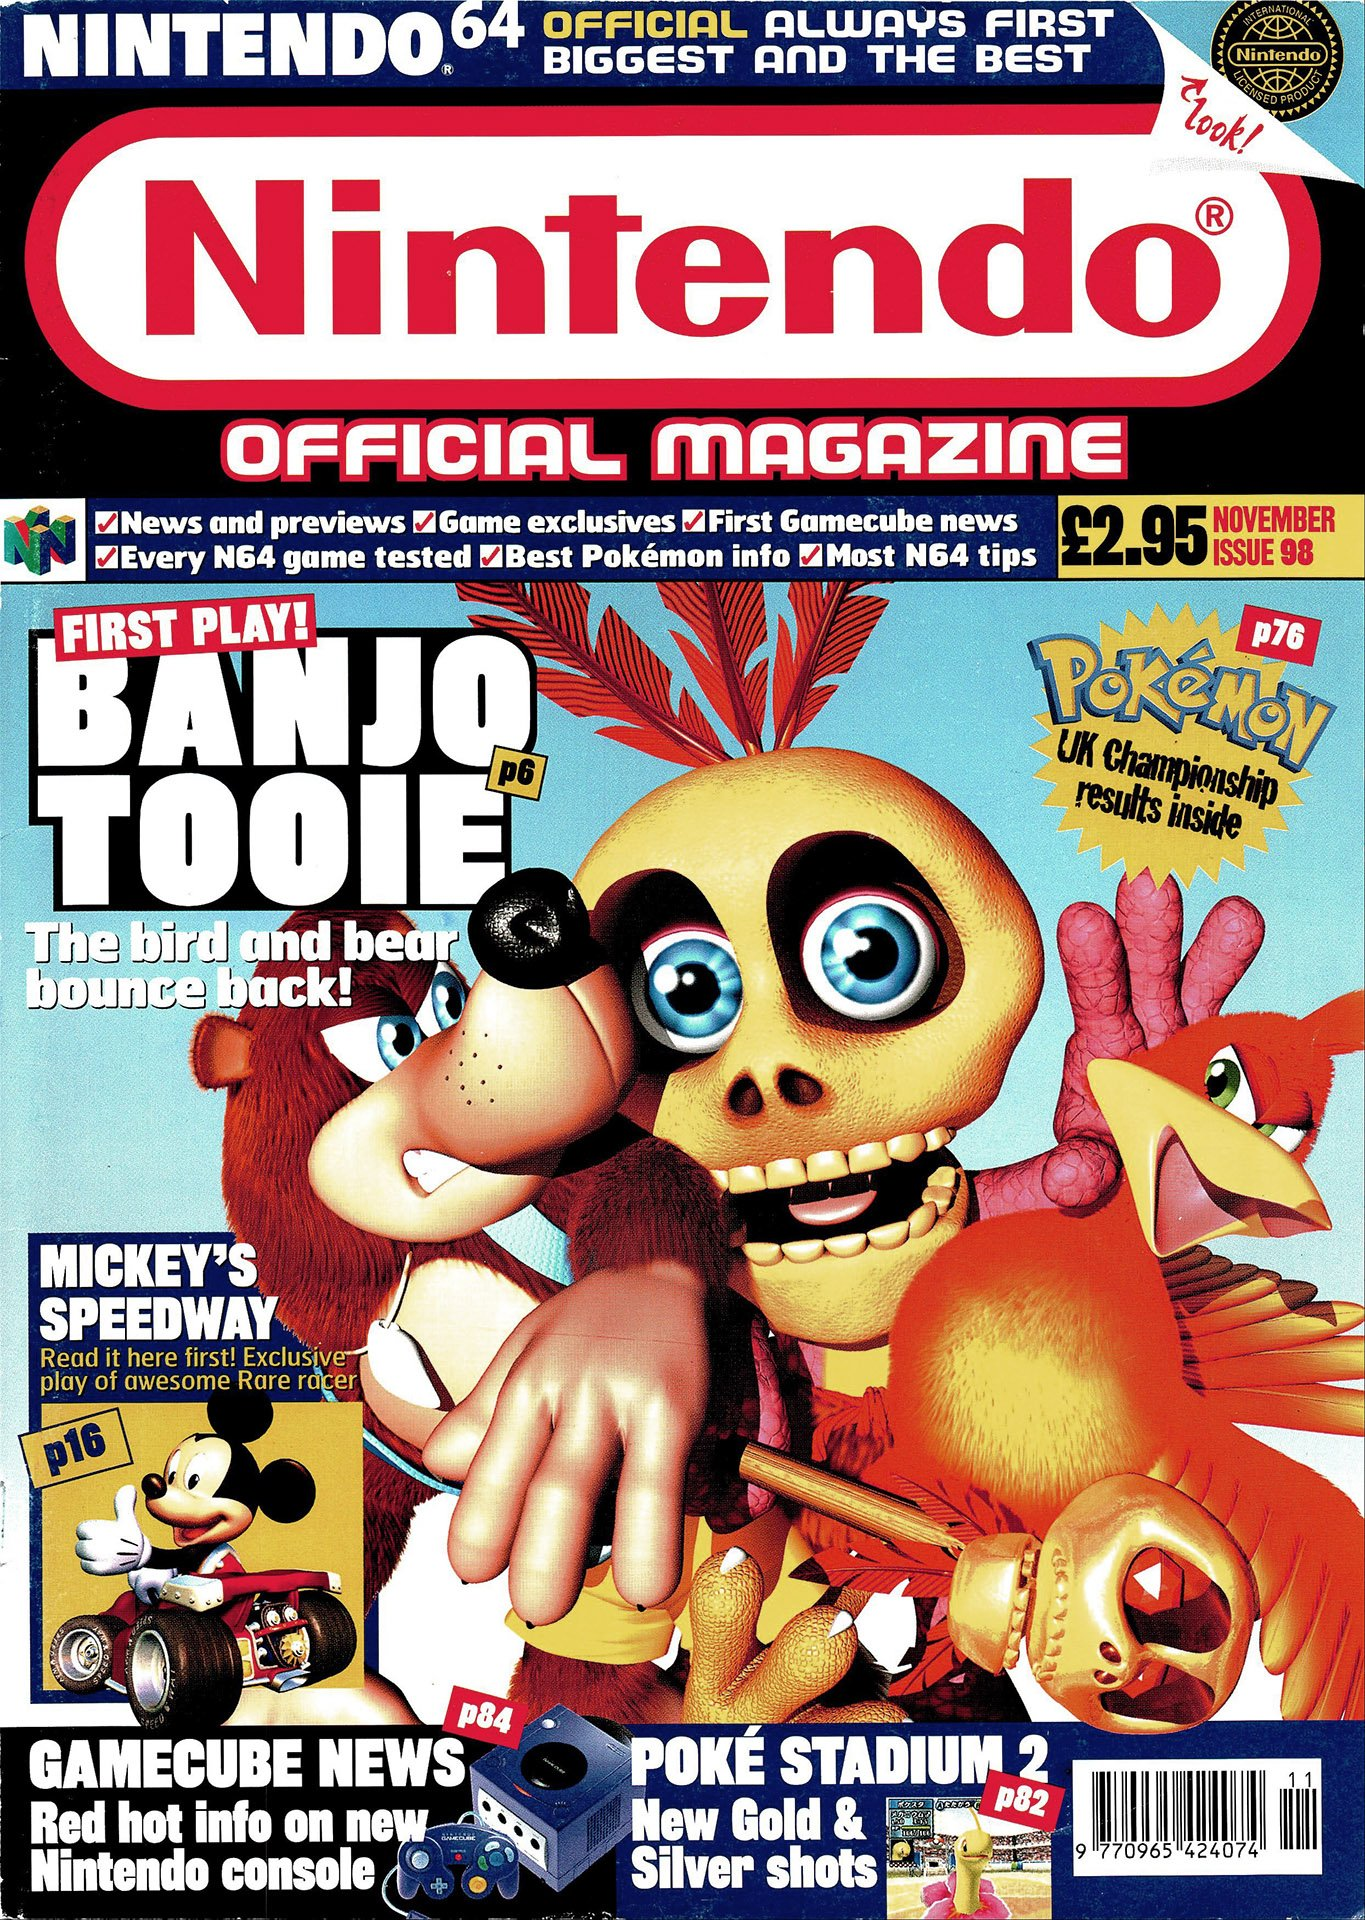 Nintendo Official Magazine 098 (November 2000)